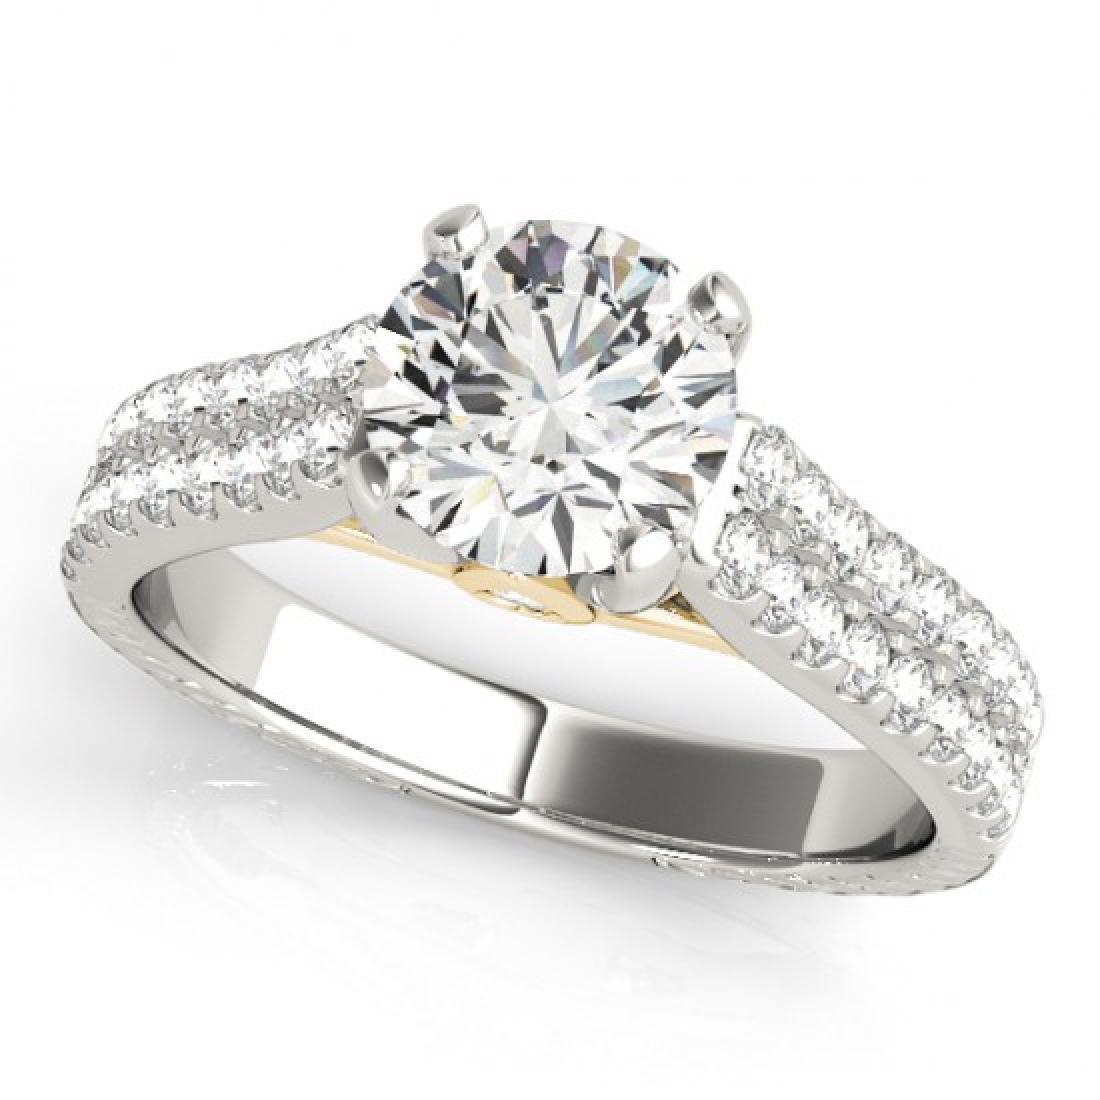 1.61 CTW Certified VS/SI Diamond Pave Ring 14K White & - 2